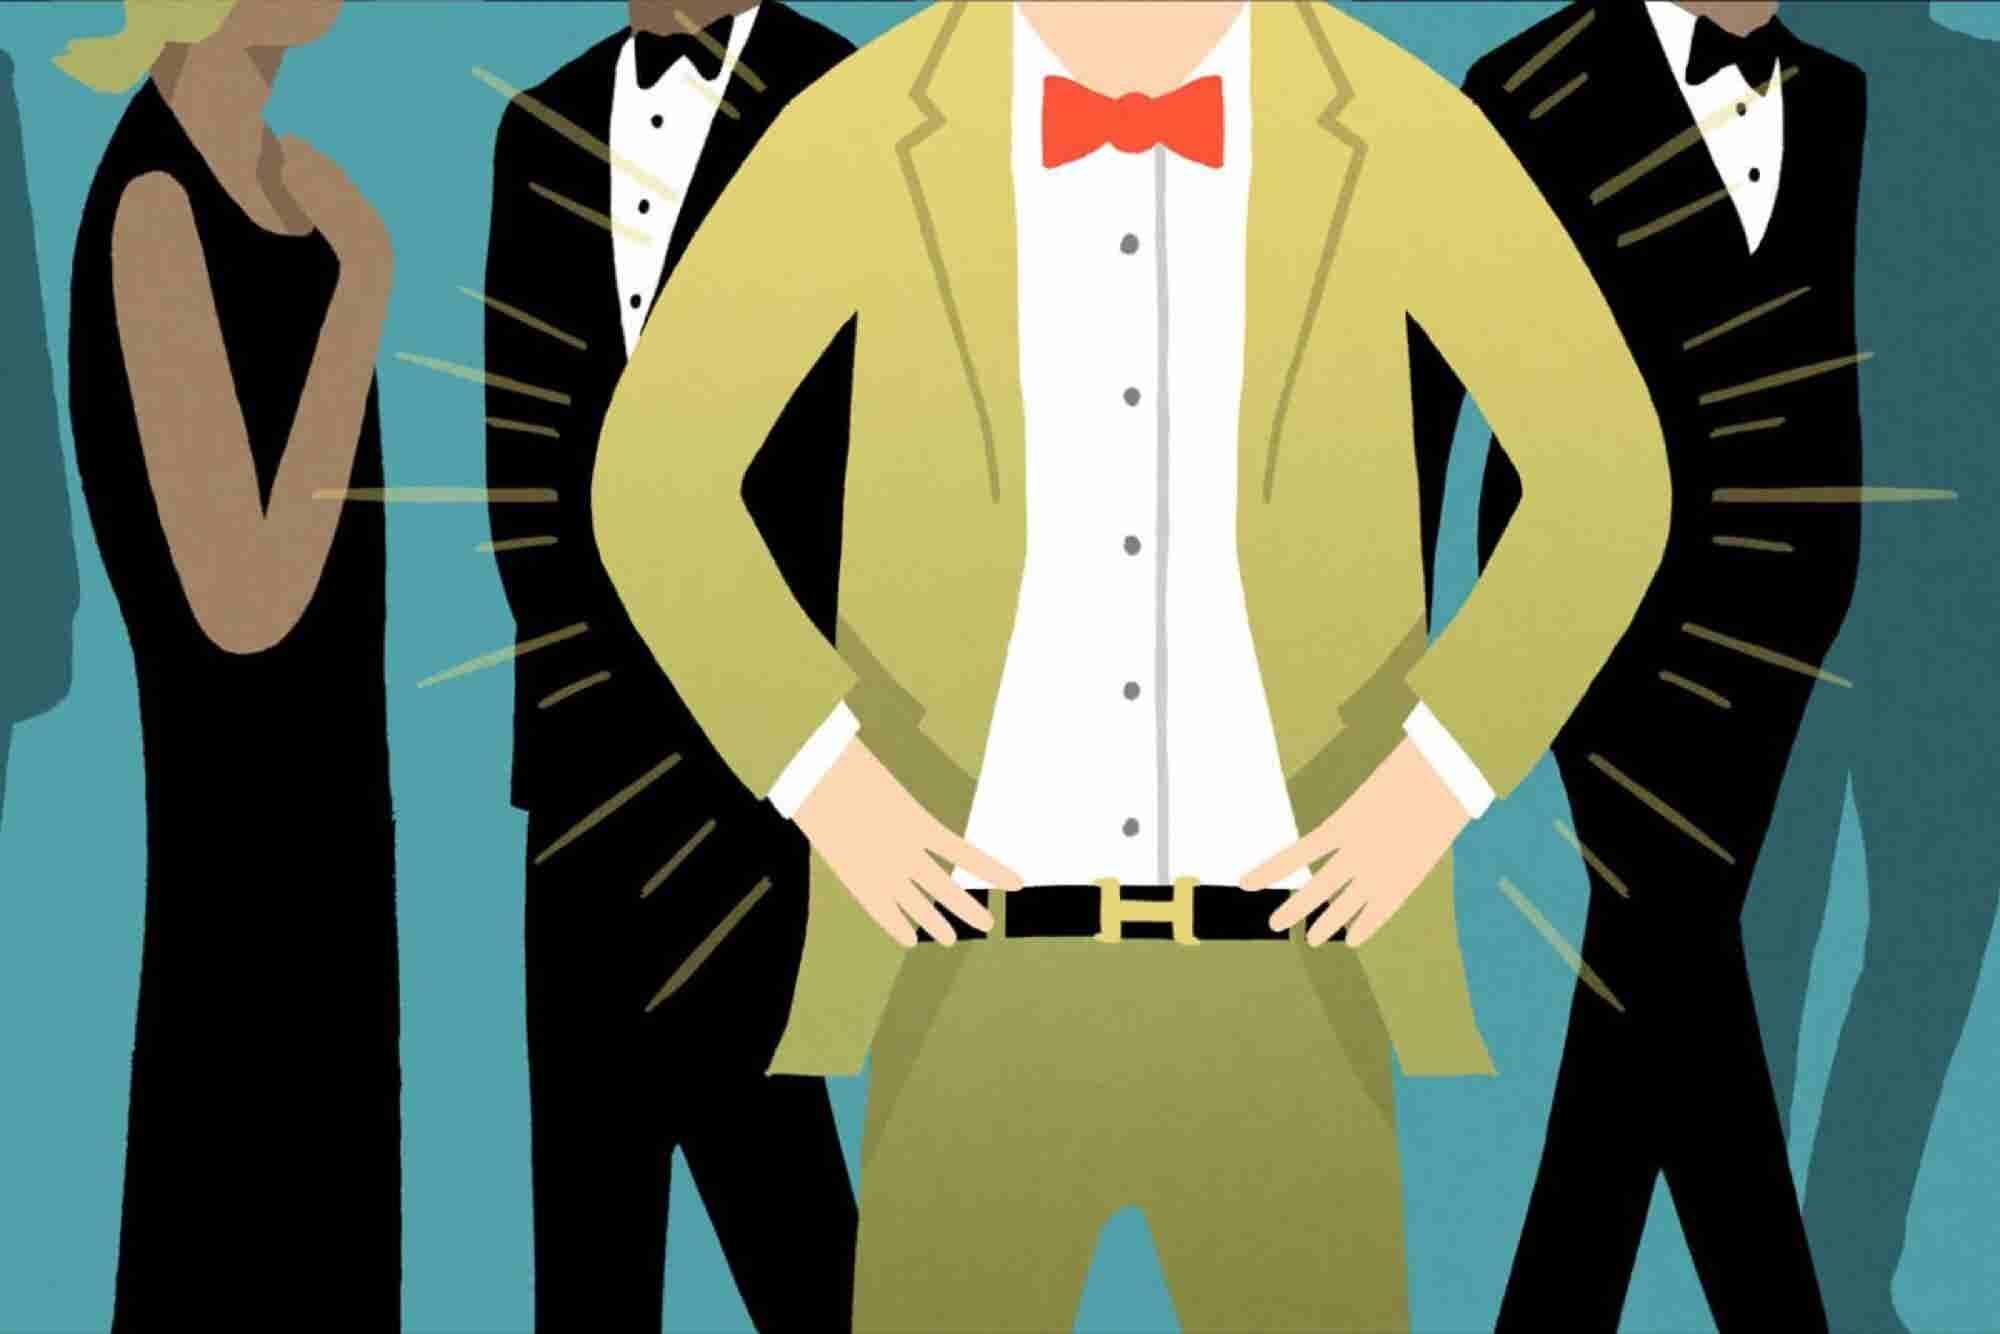 6 Odd Ways Top Entrepreneurs Found Success Going Against the Grain